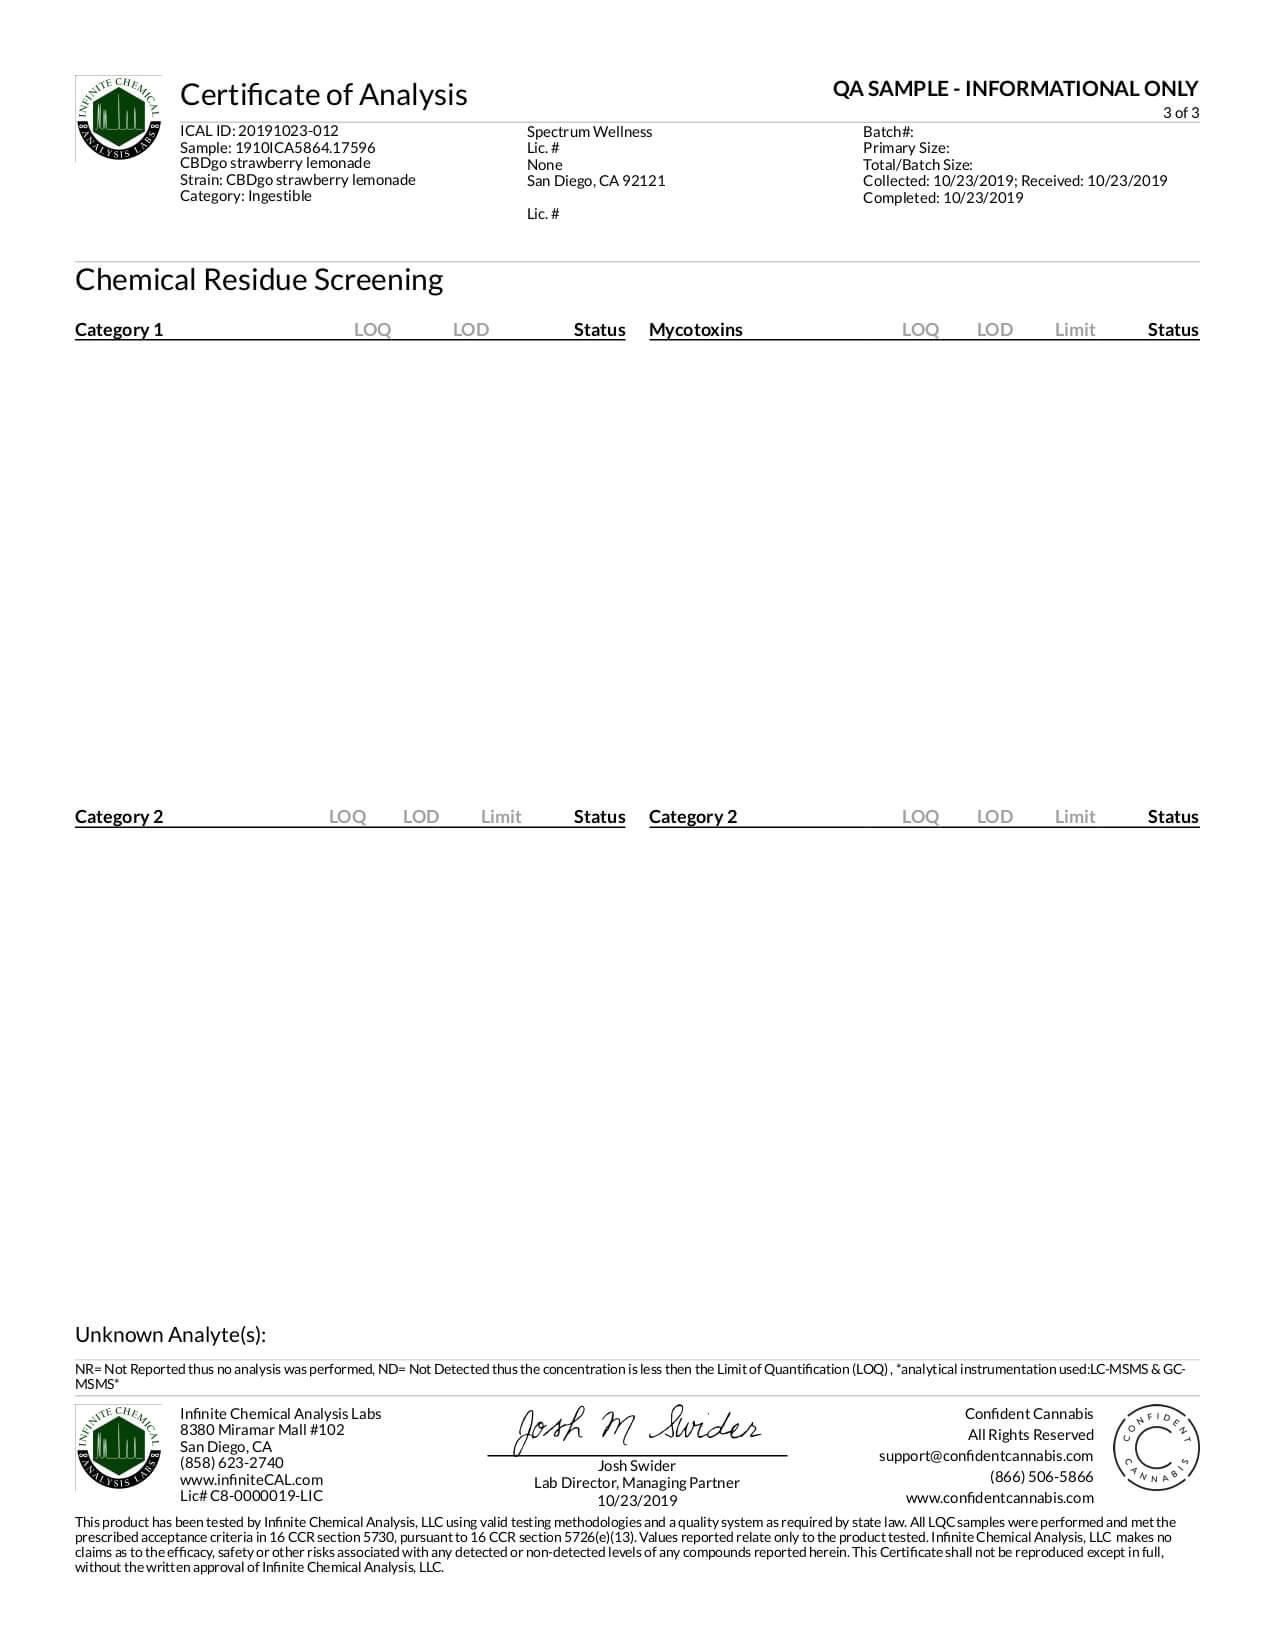 CBDgo CBD Drink Day/Night 12 Pack Strawberry Lemonade Shot Lab Report